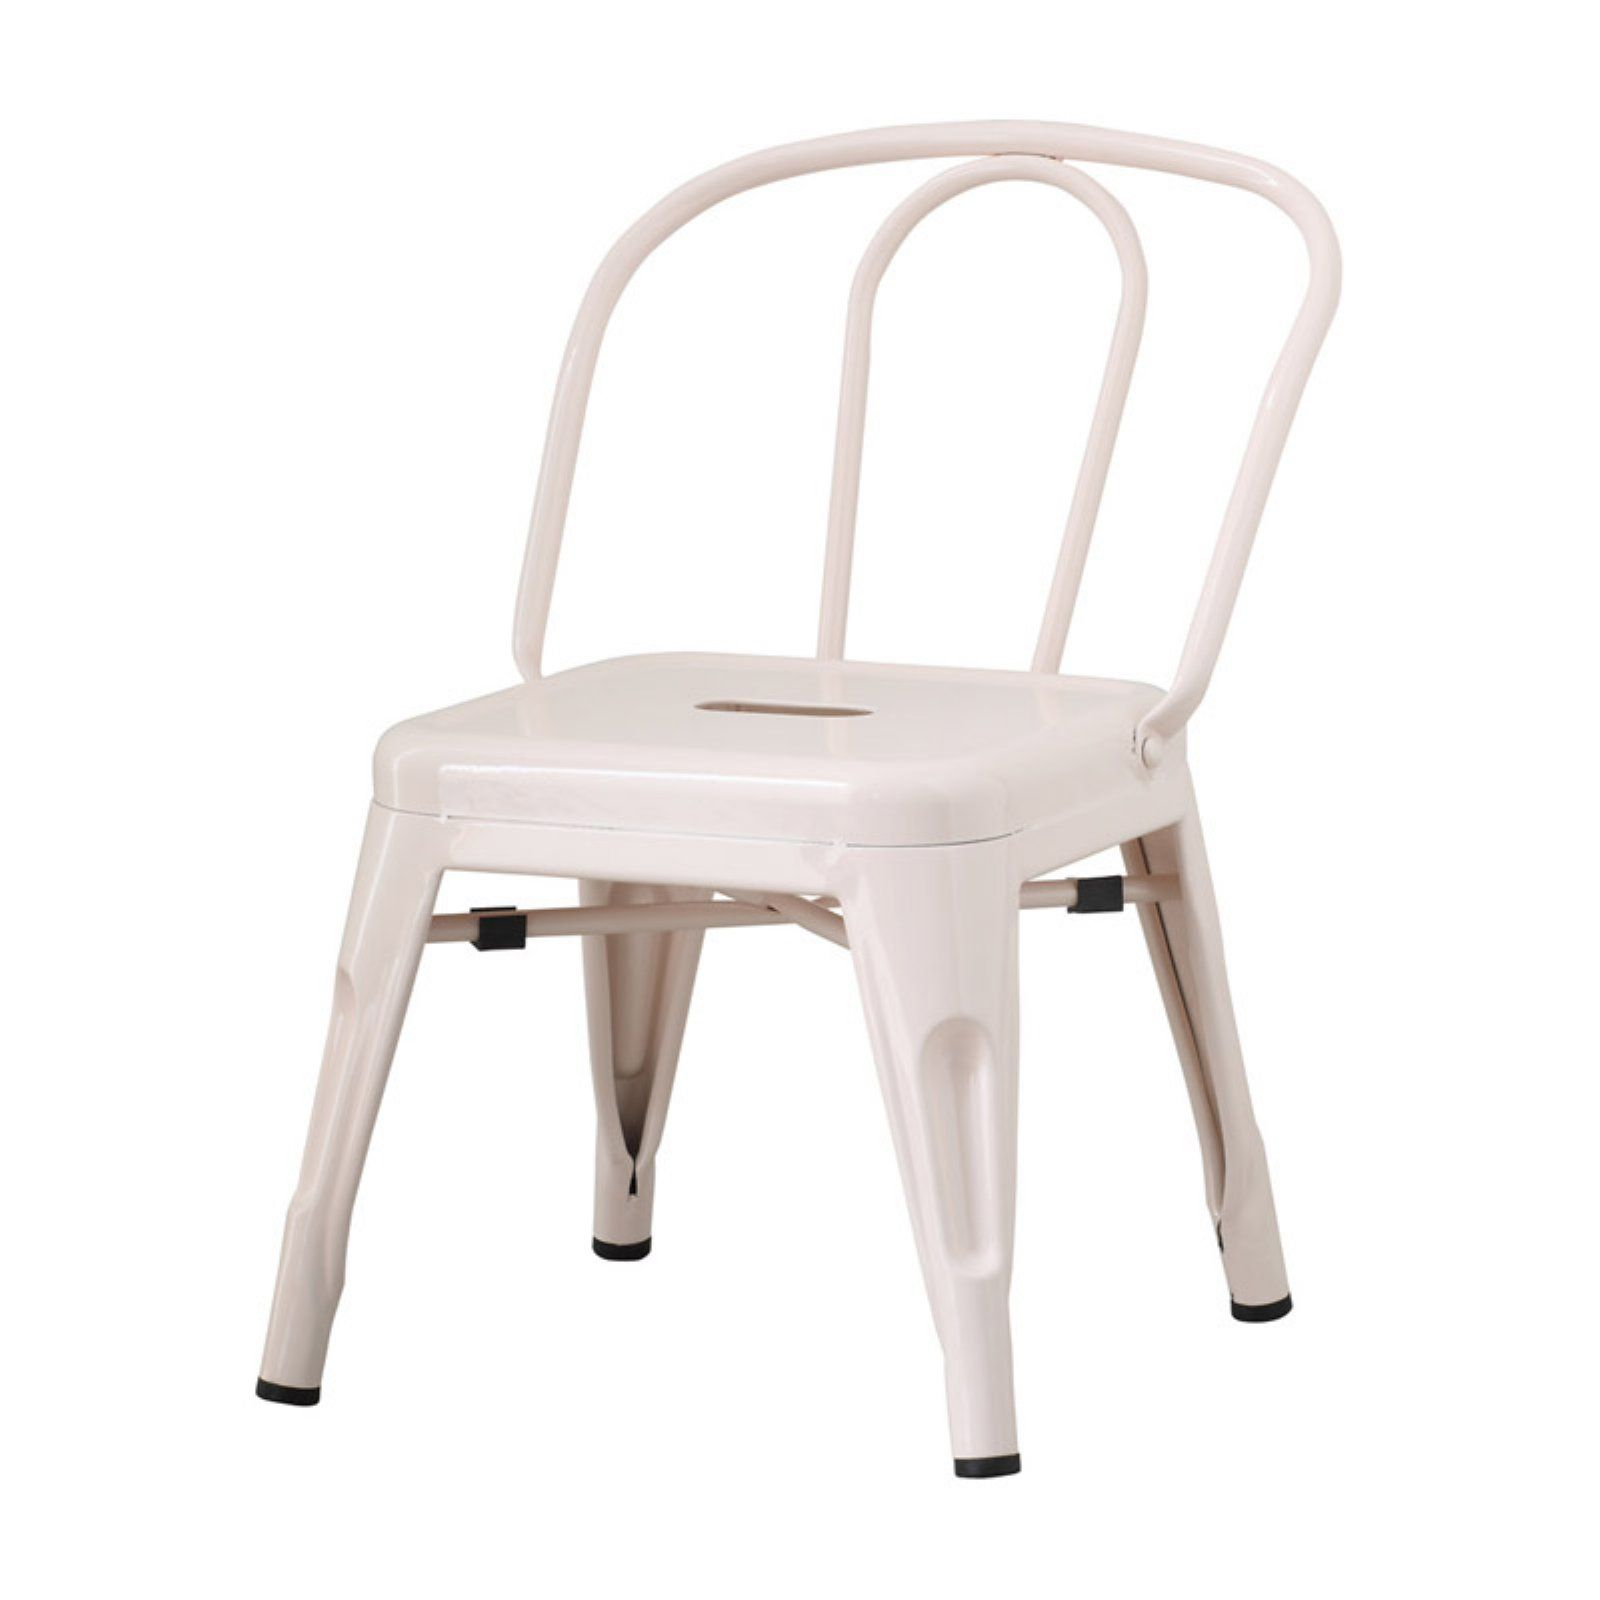 3r Studios Small Metal Kids Chair Pink Kids Chairs Chair Metal